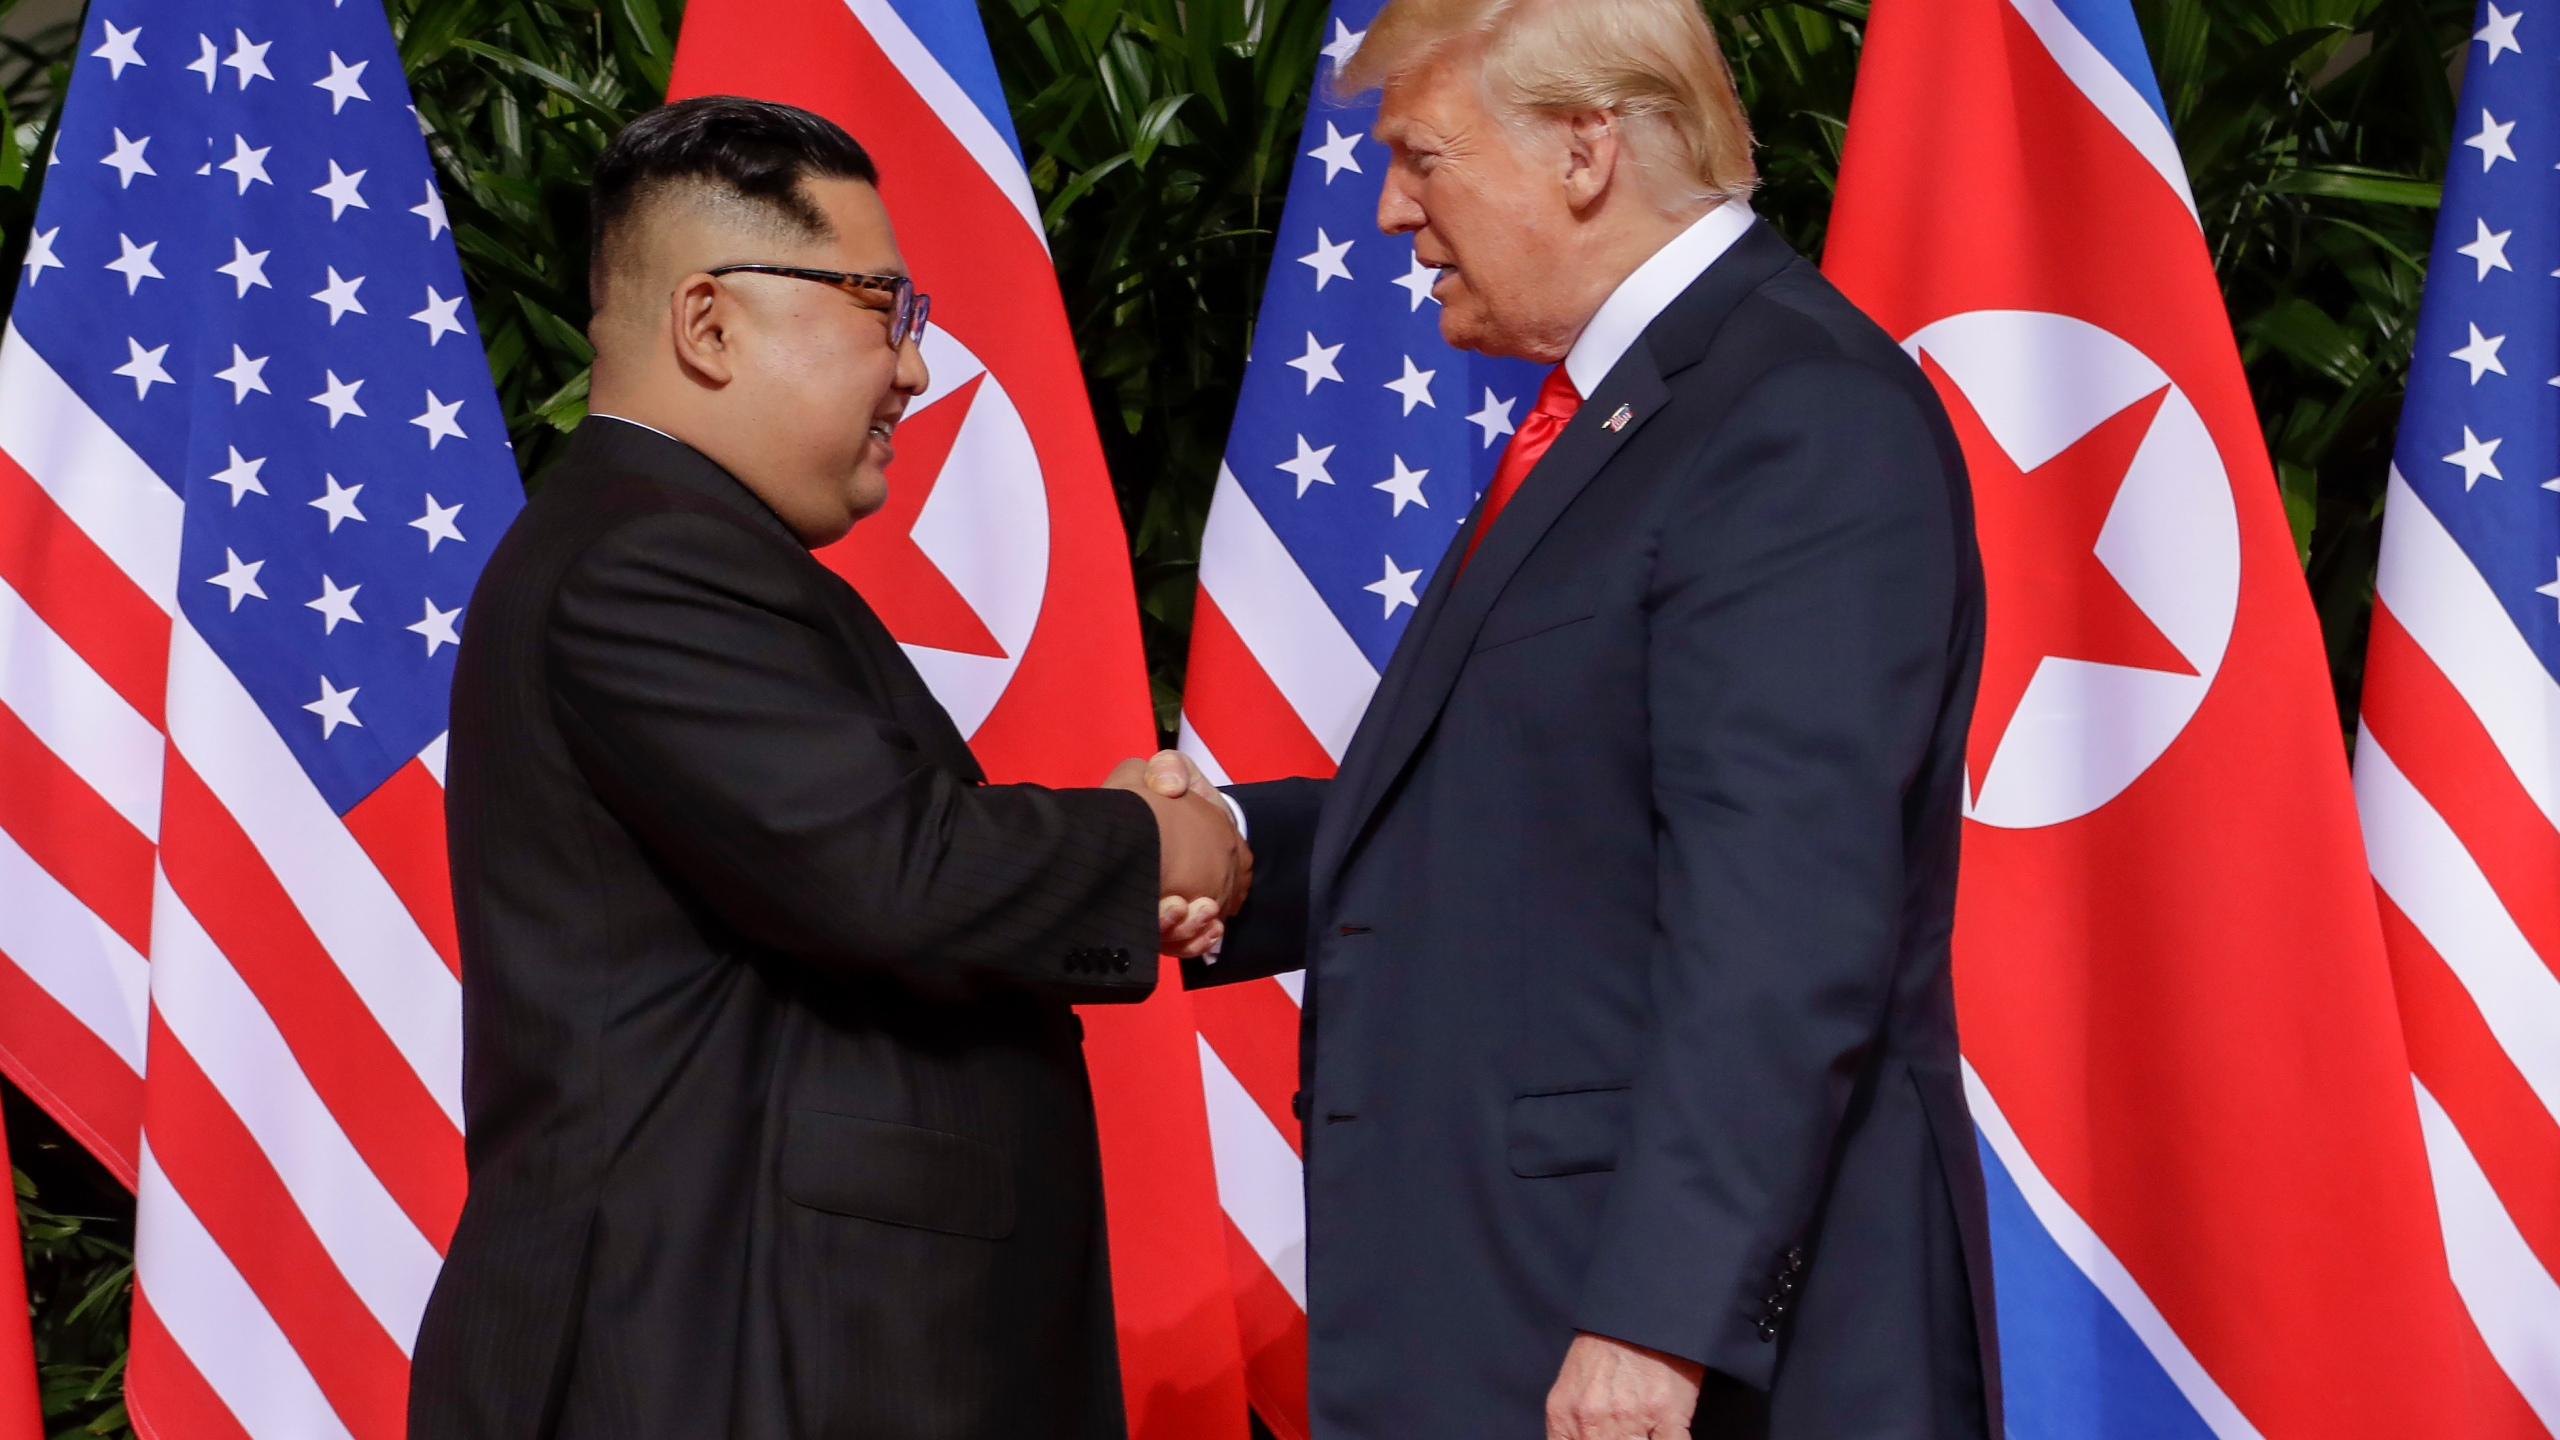 APTOPIX_Trump_Kim_Summit_66325-159532.jpg51848592